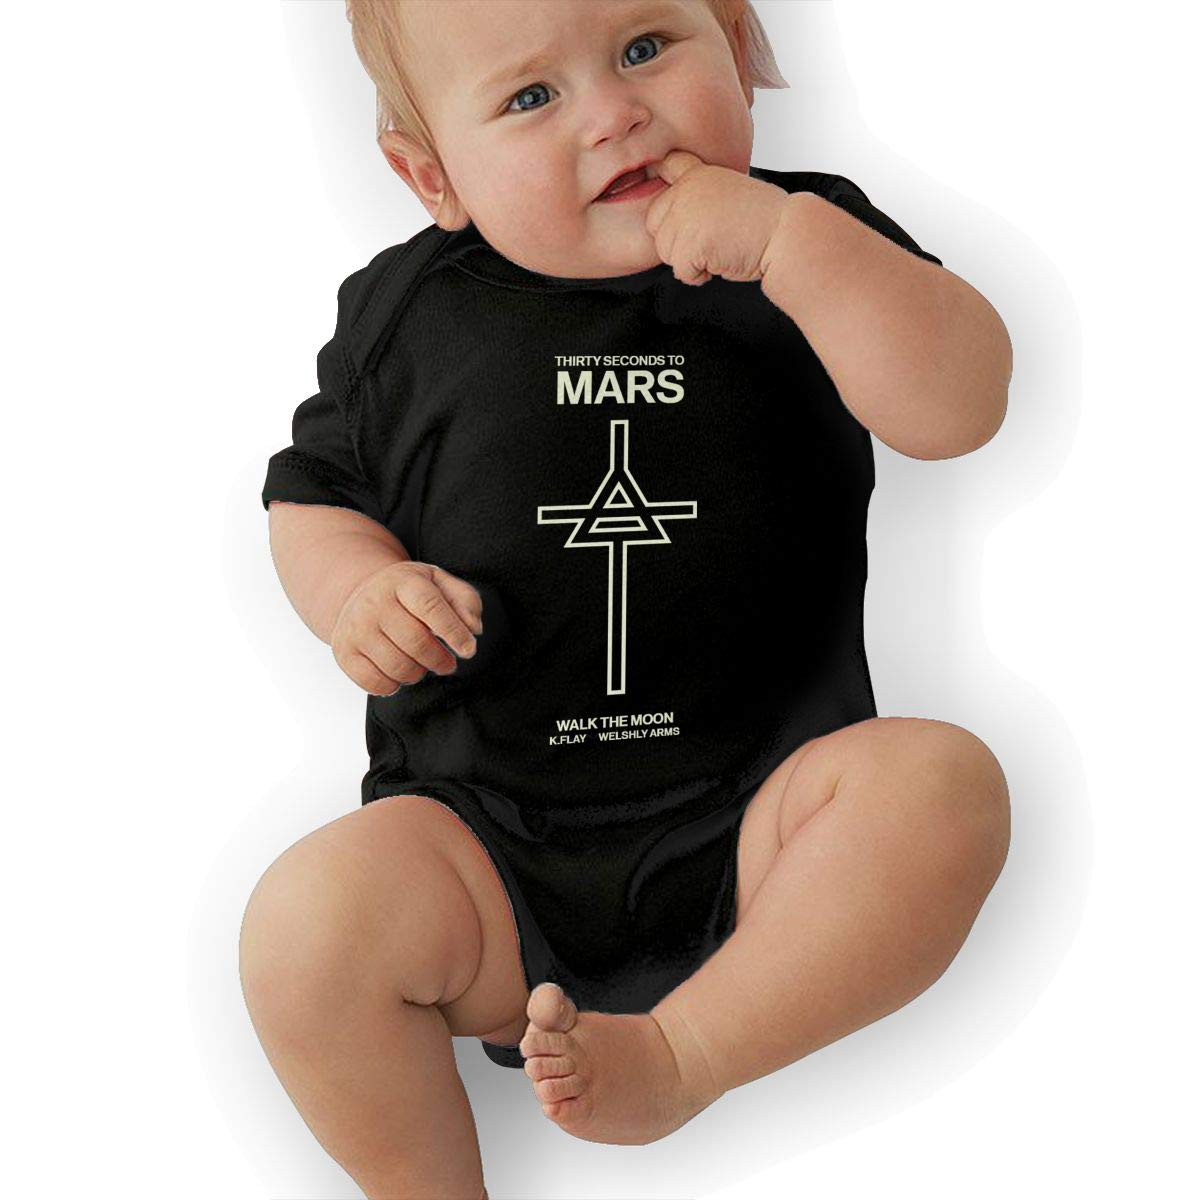 LuckyTagy Thirty Seconds to Mars Logo Unisex Vintage Toddler Romper Baby GirlPlaysuit Black